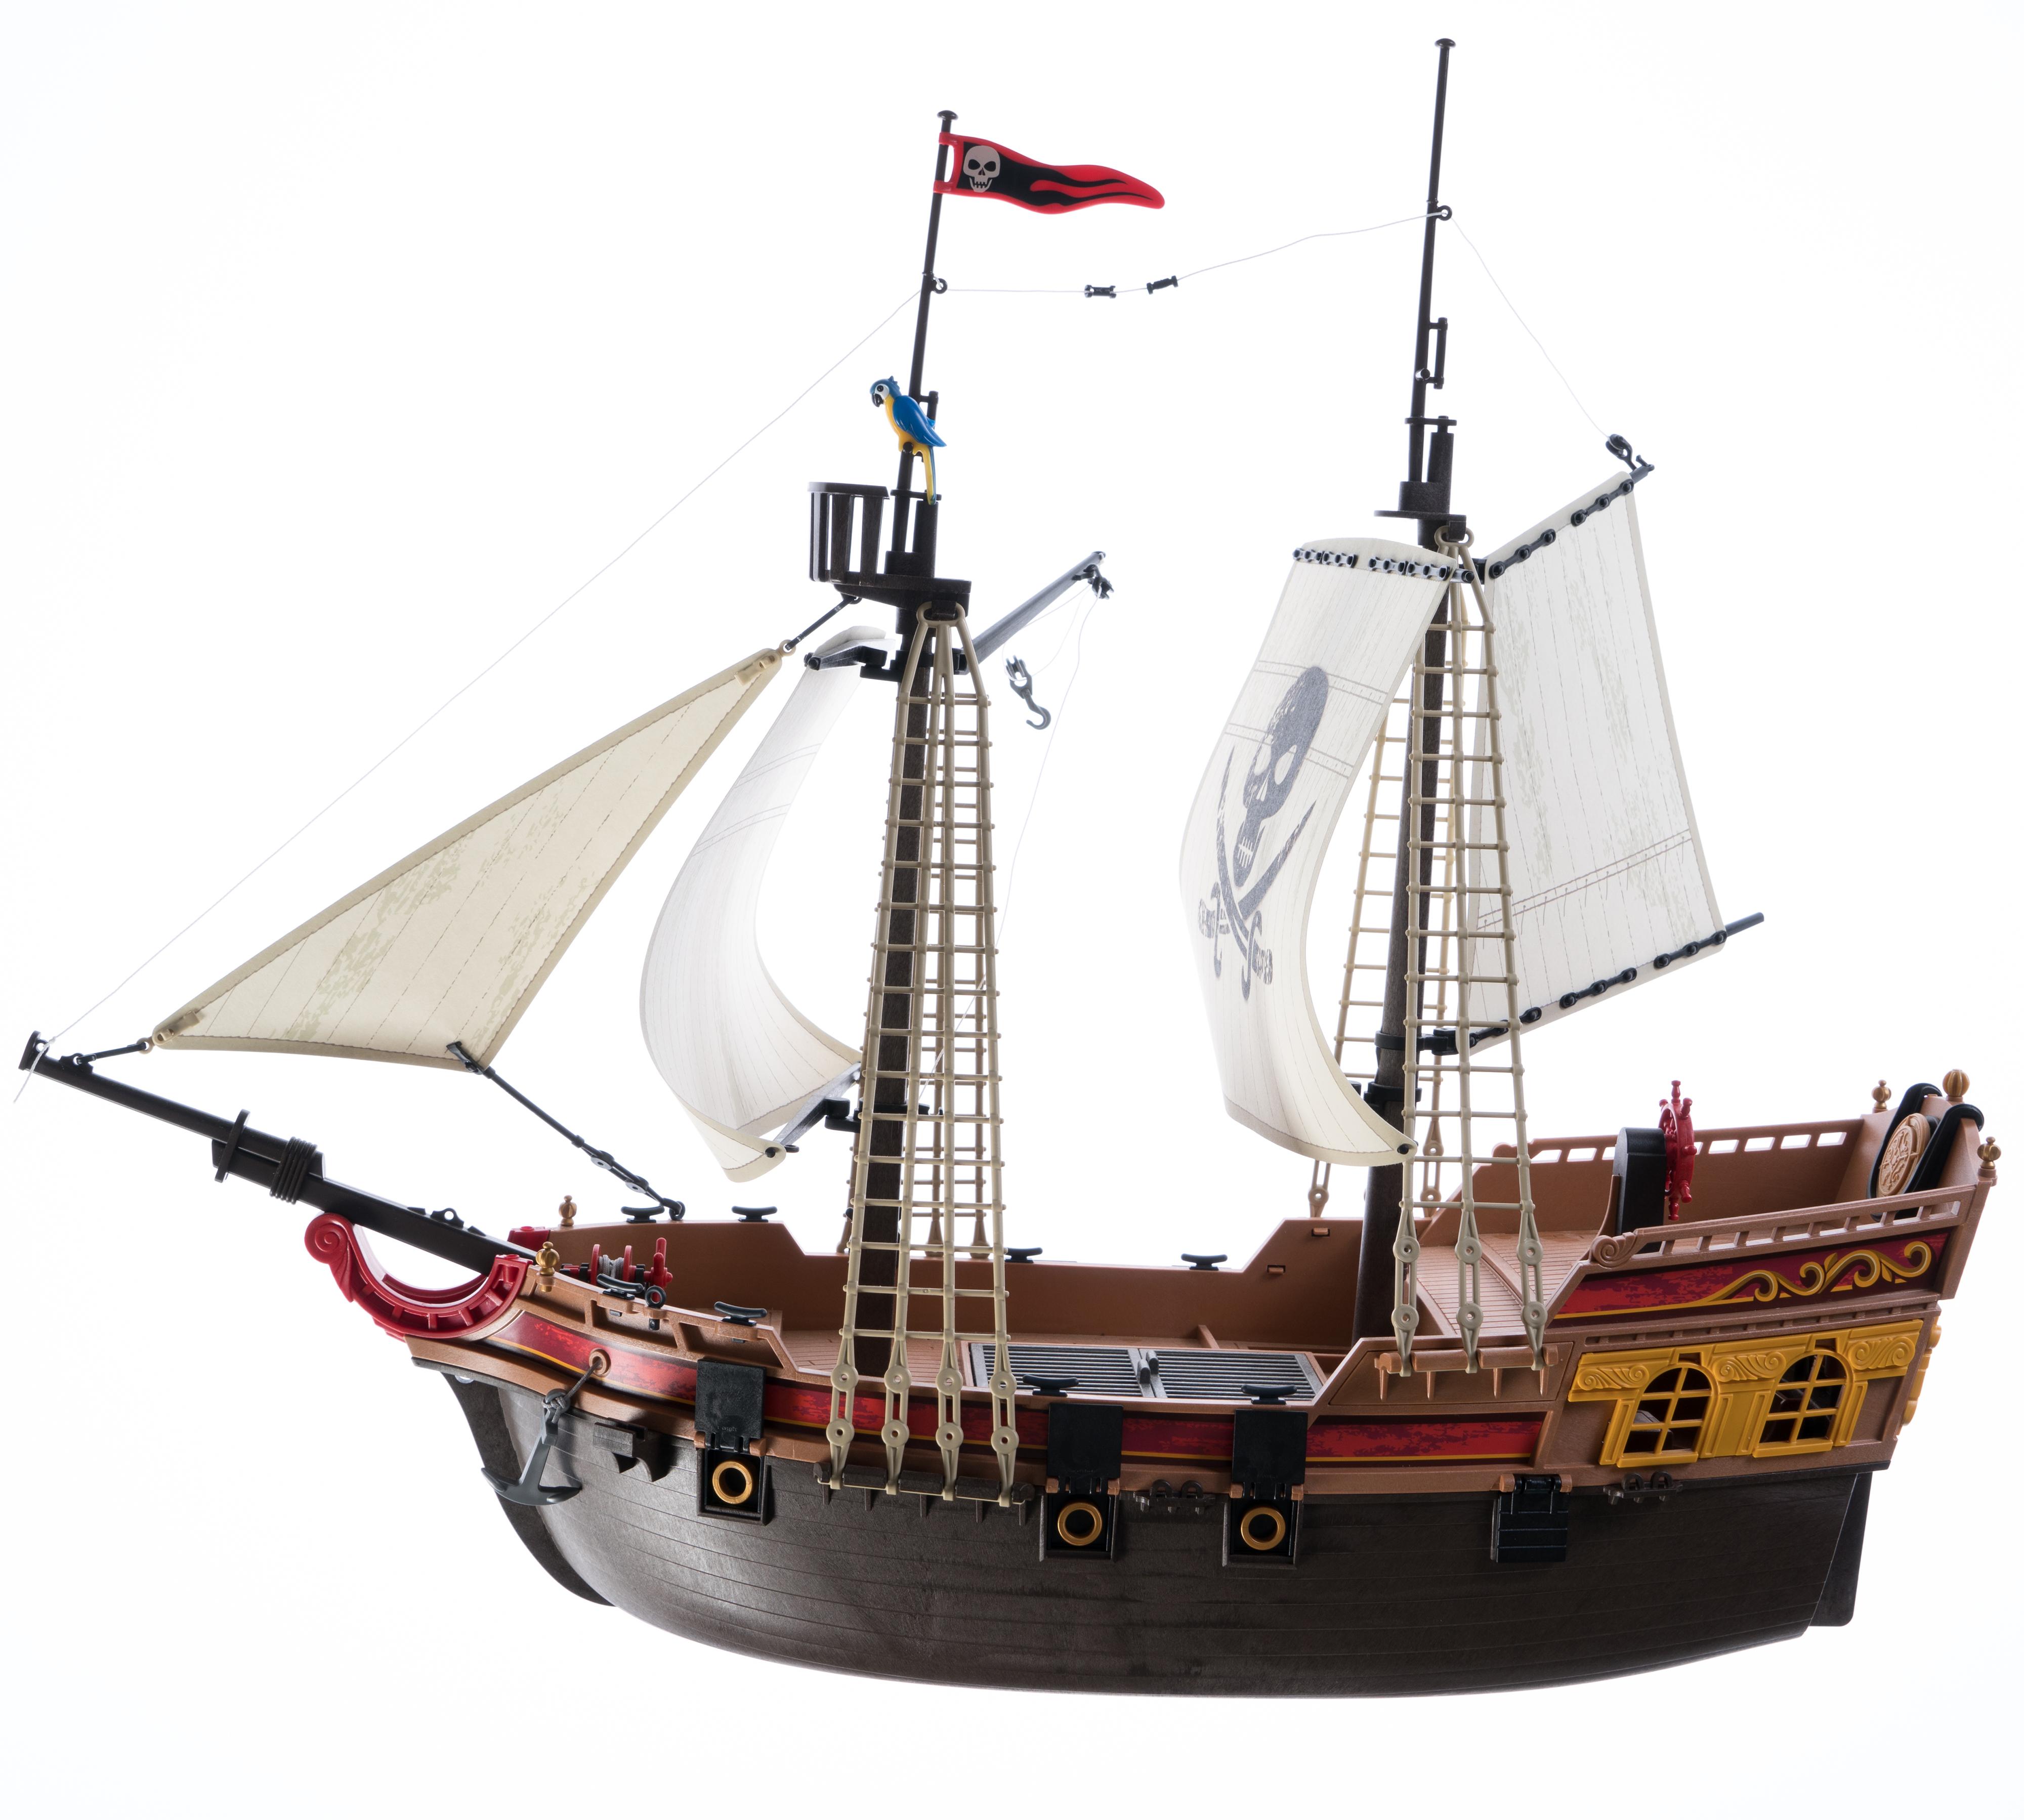 free usps shipping software pirate ship. Black Bedroom Furniture Sets. Home Design Ideas